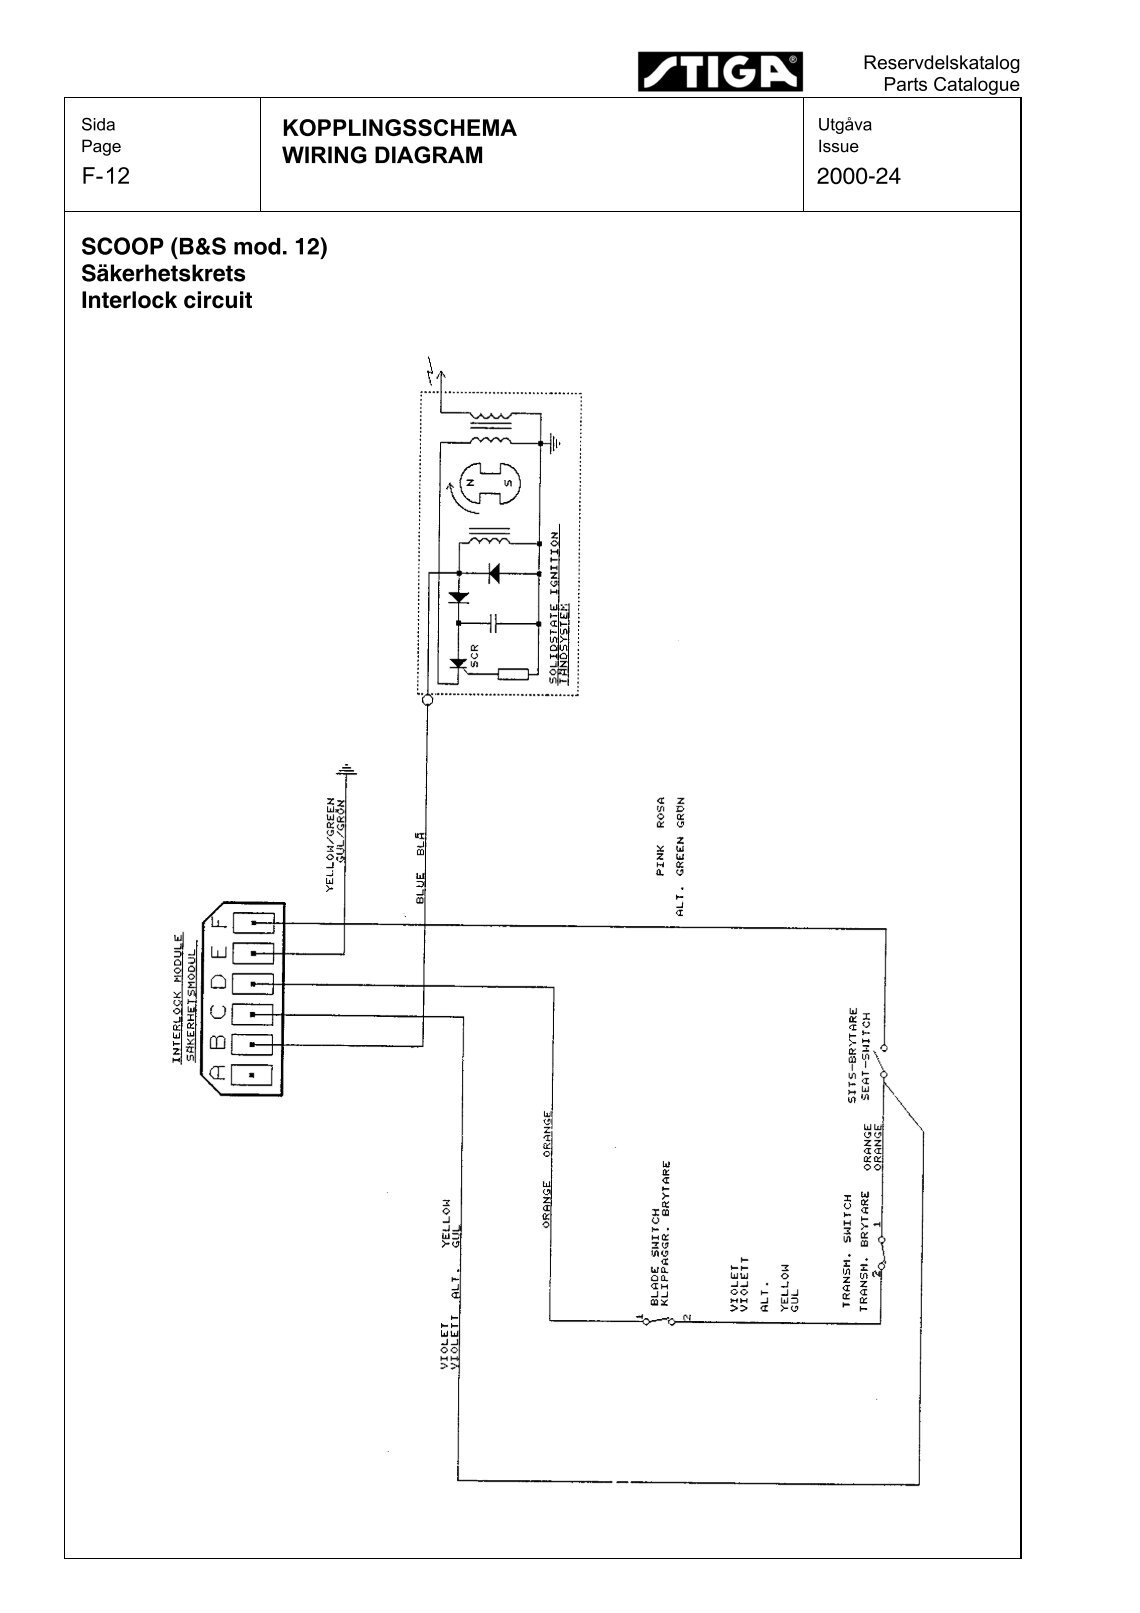 Volvo Ec210 Wiring Diagram. . Wiring Diagram